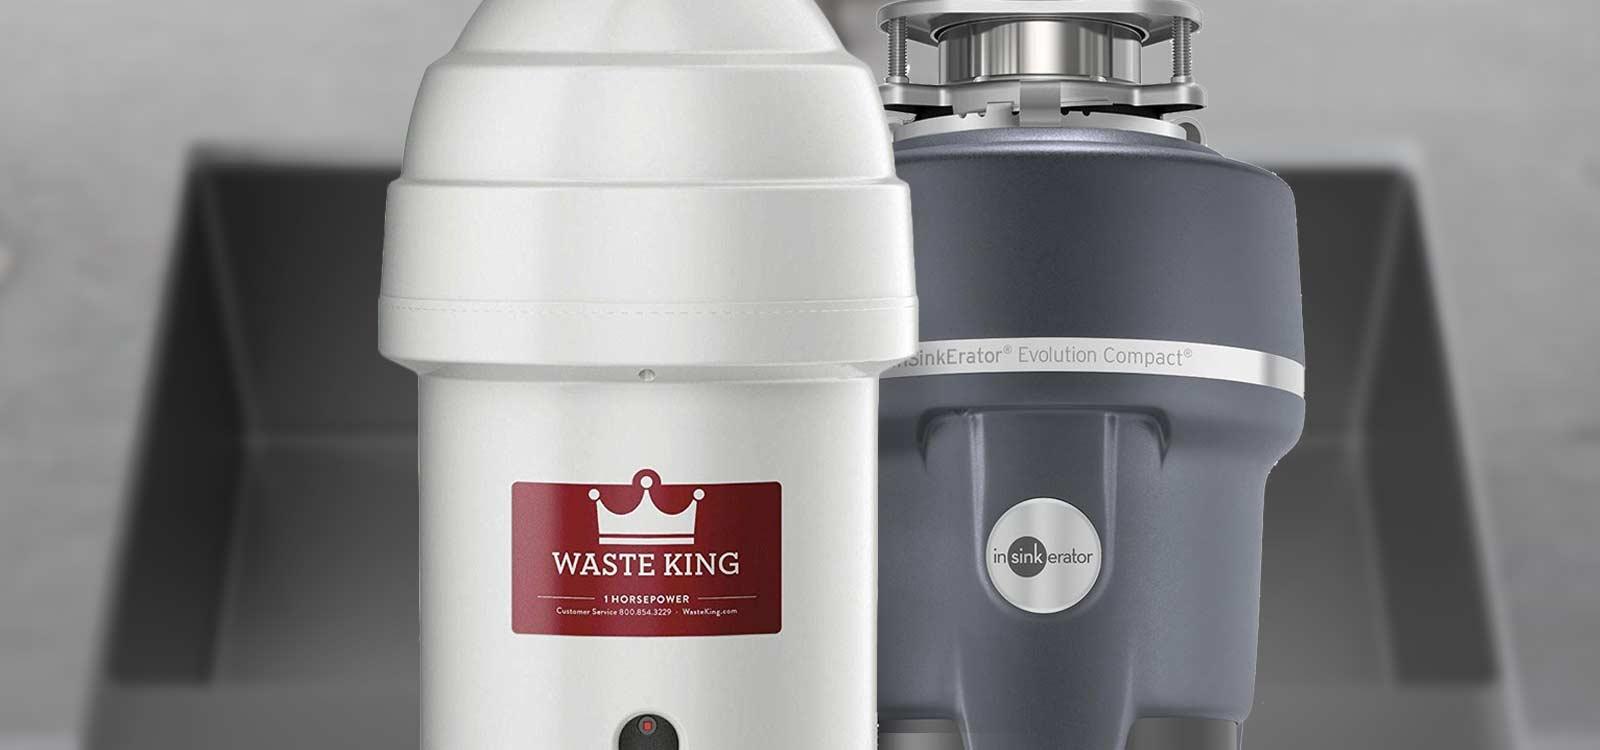 Waste-King-vs-InSinkErator-garbage-disposals-header